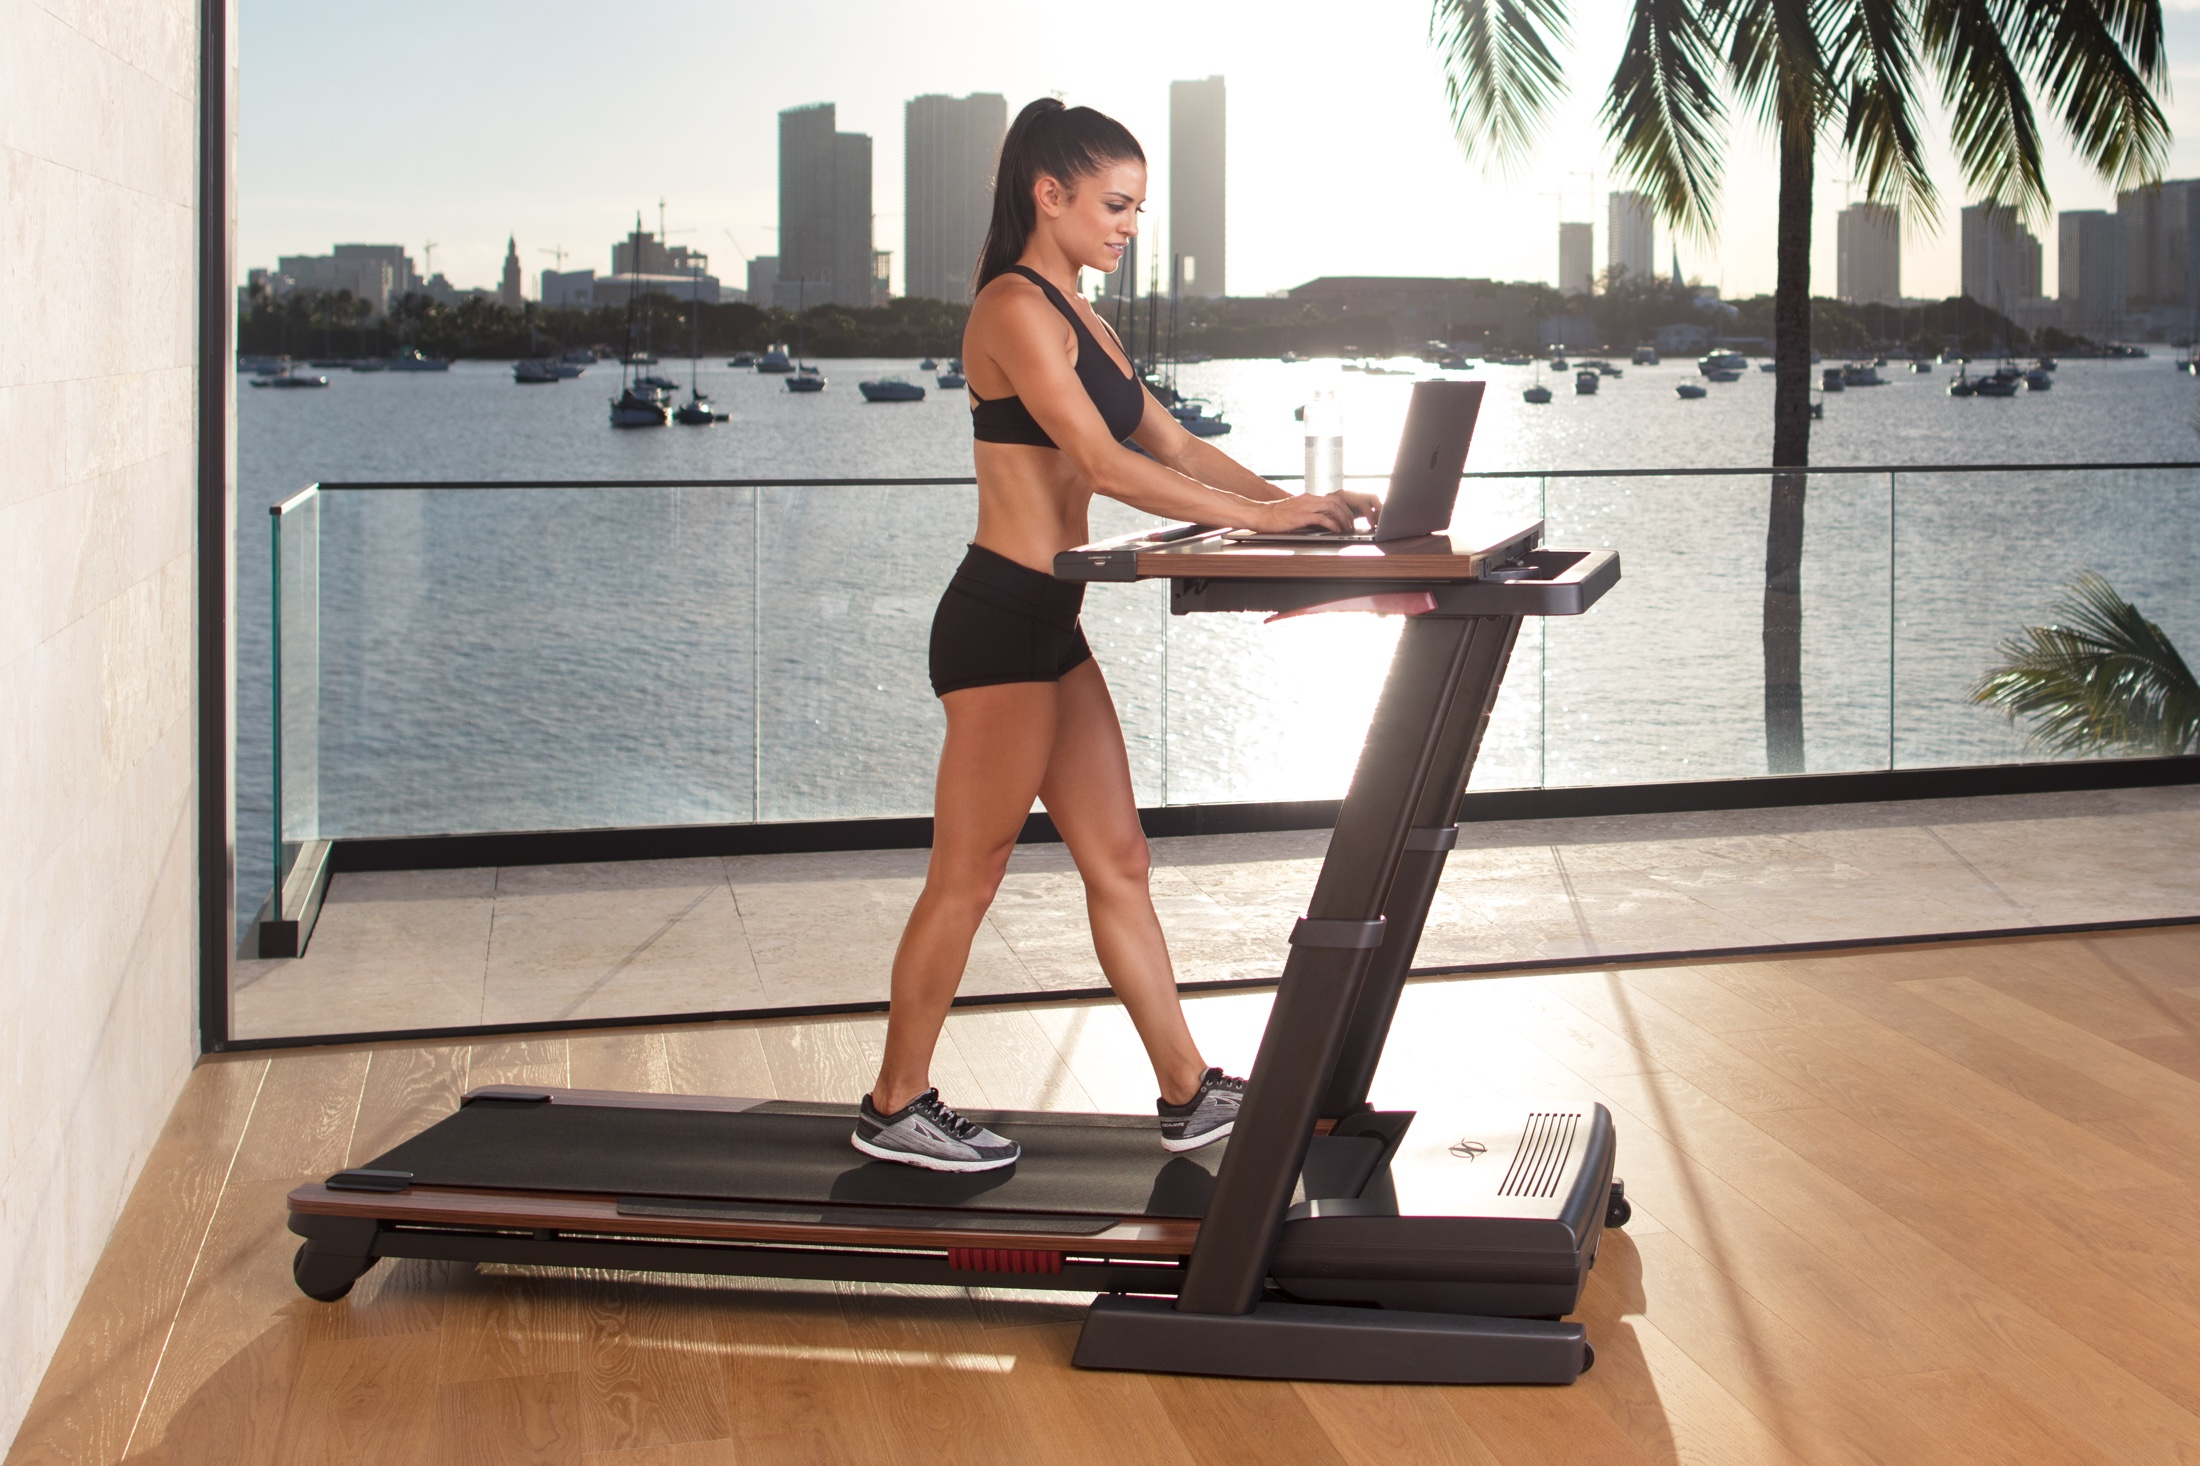 NordicTrack Treadmill Desk Platinum gallery image 4